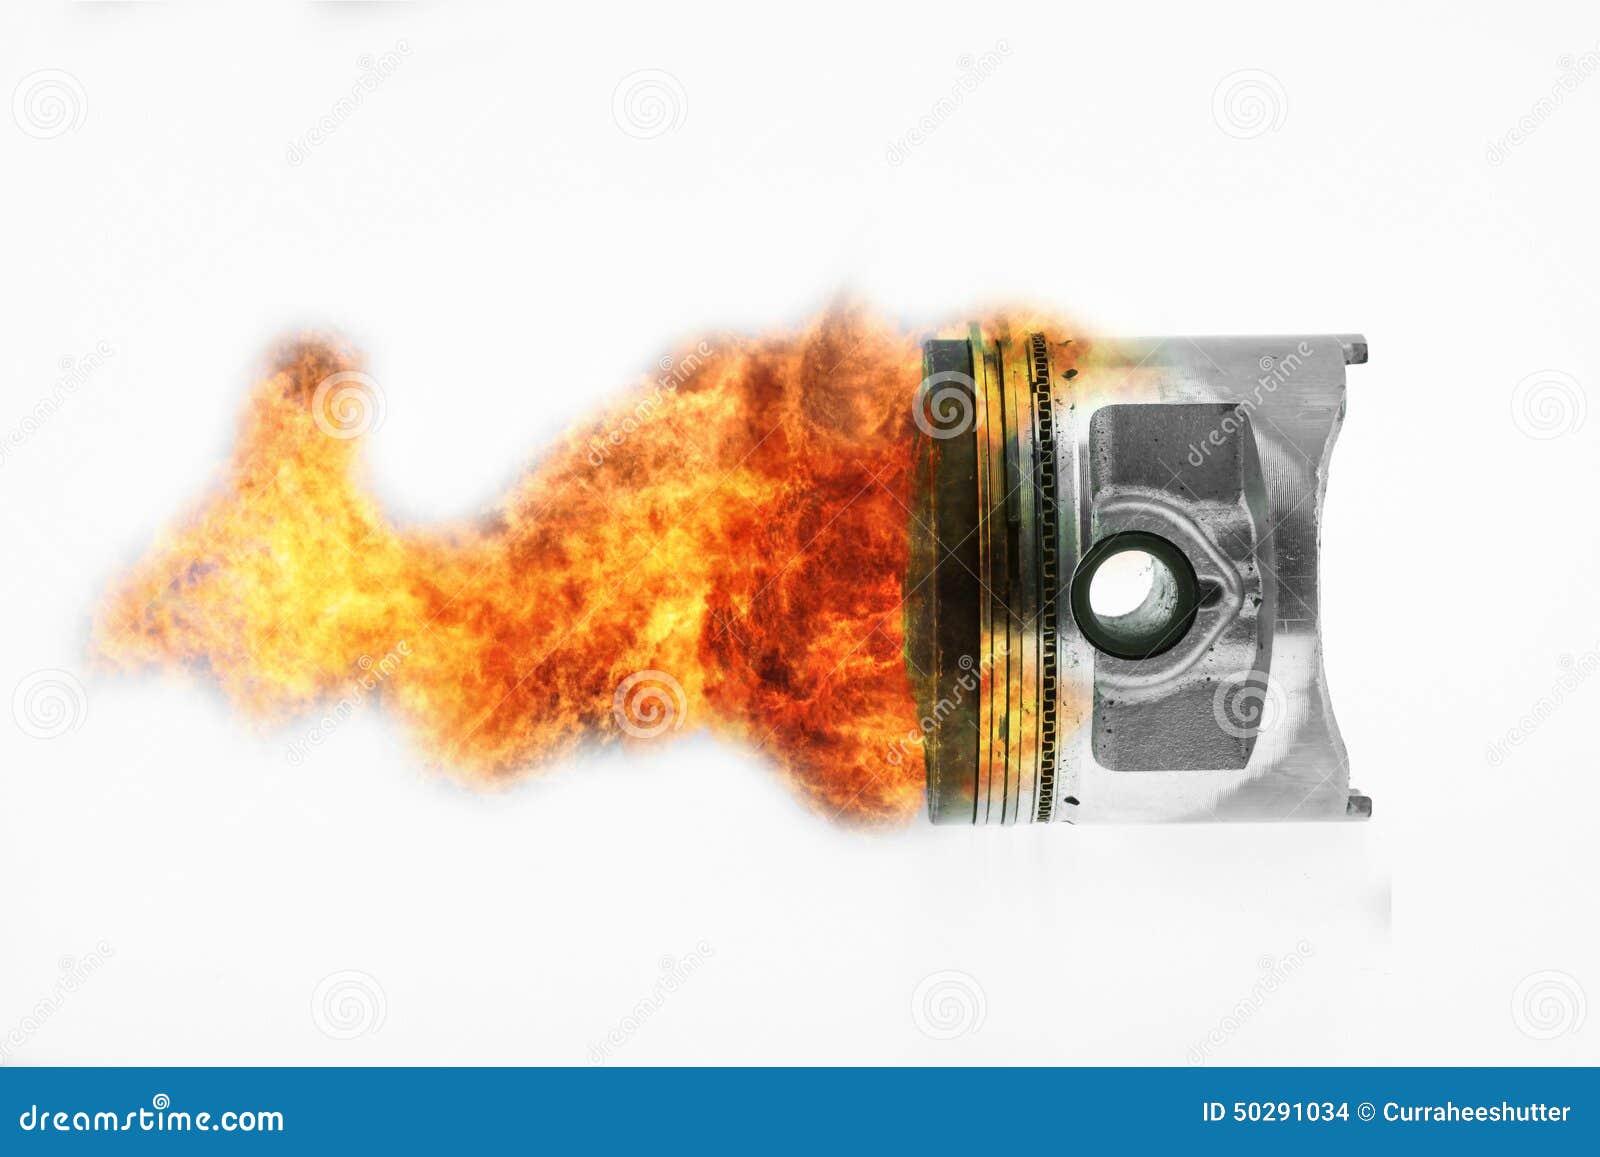 Fuel Burning On Top Of Engine Piston Burning Fire Flame On Engine Piston Stock Photo Image